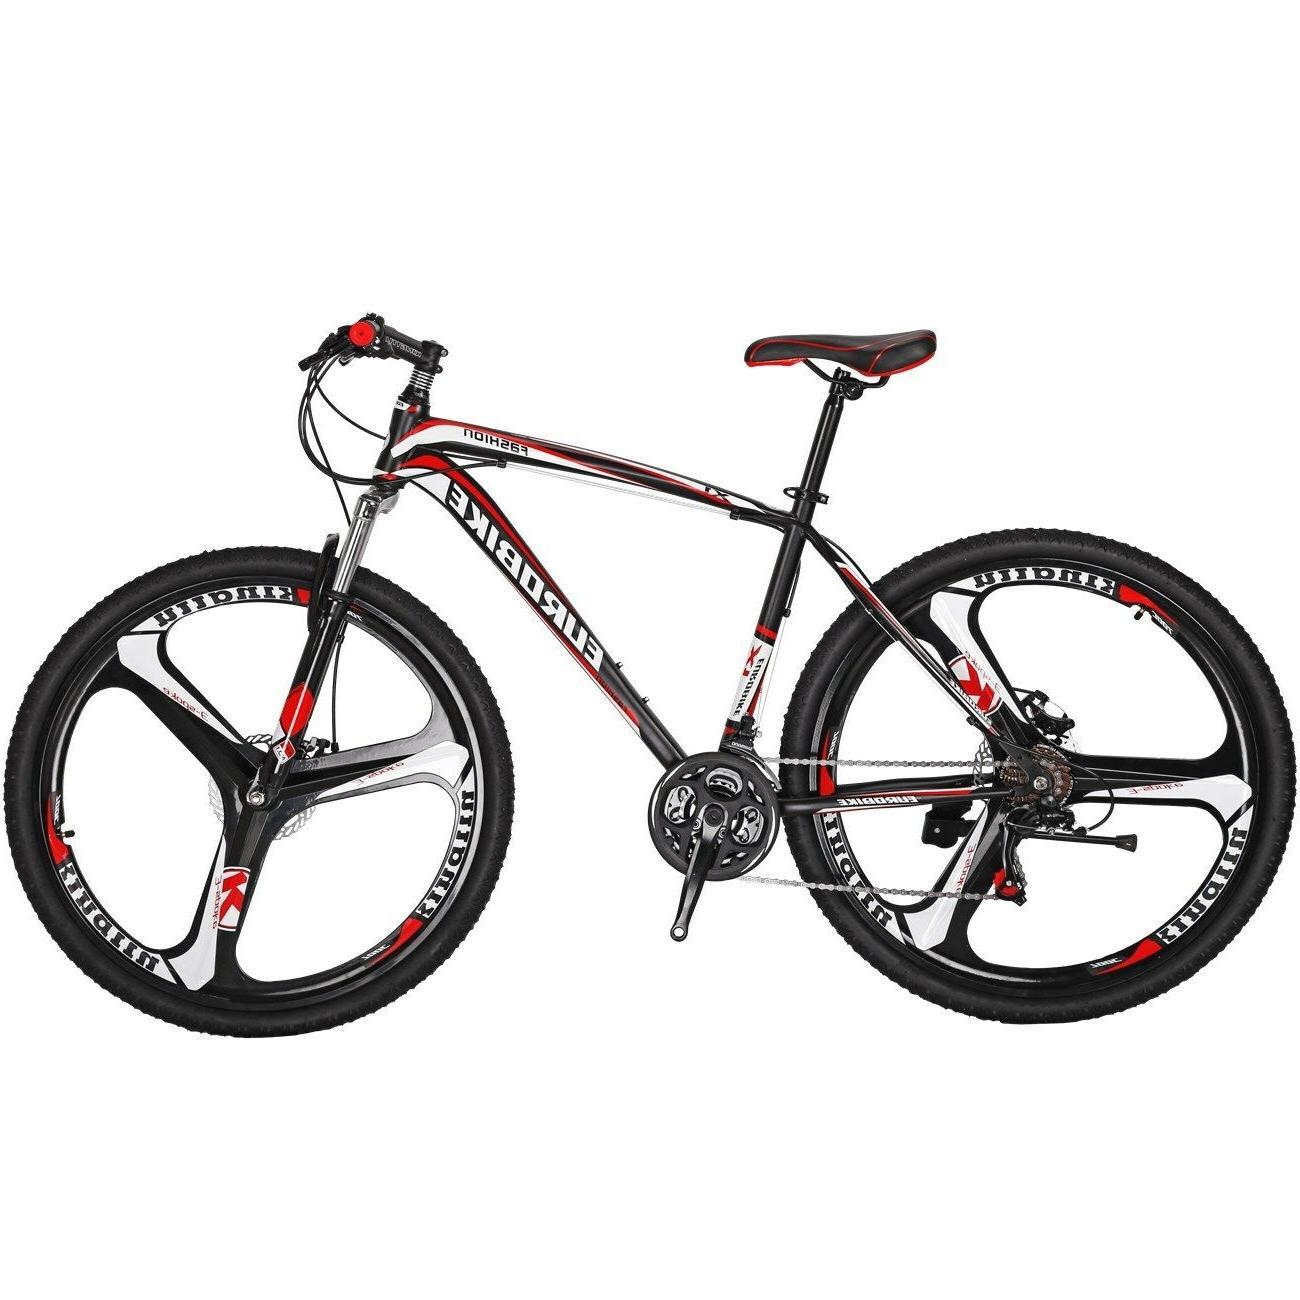 29er mountain bike 21 speed mens bikes